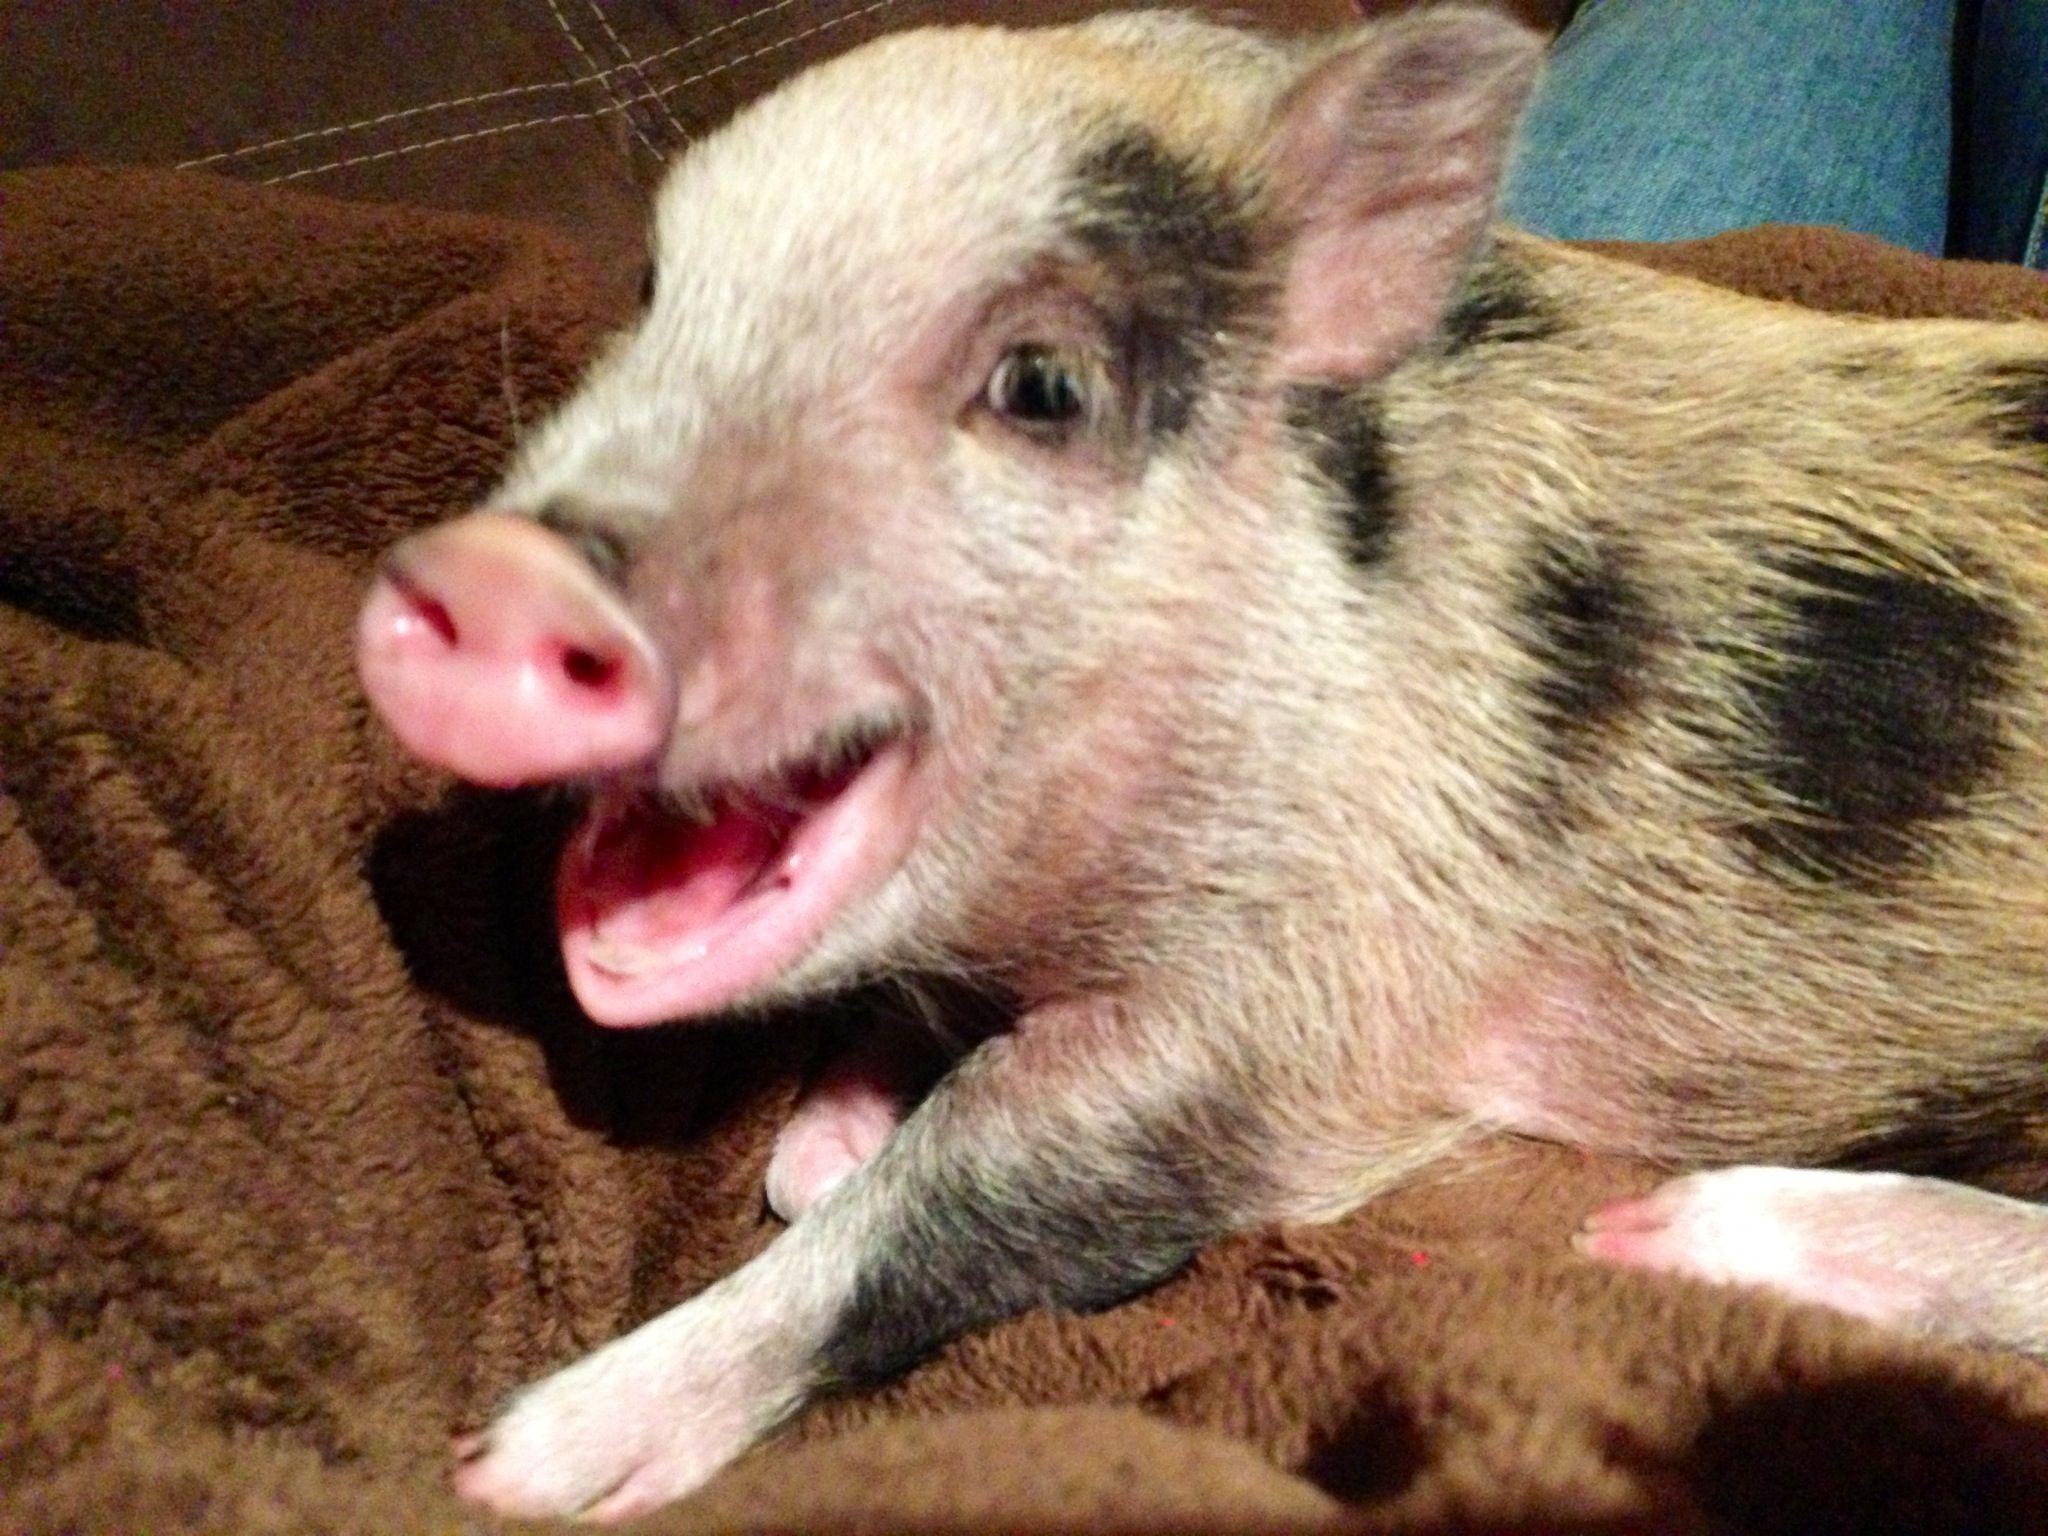 Caught my mini pig, Clementine, midyawn! haha Mini pigs